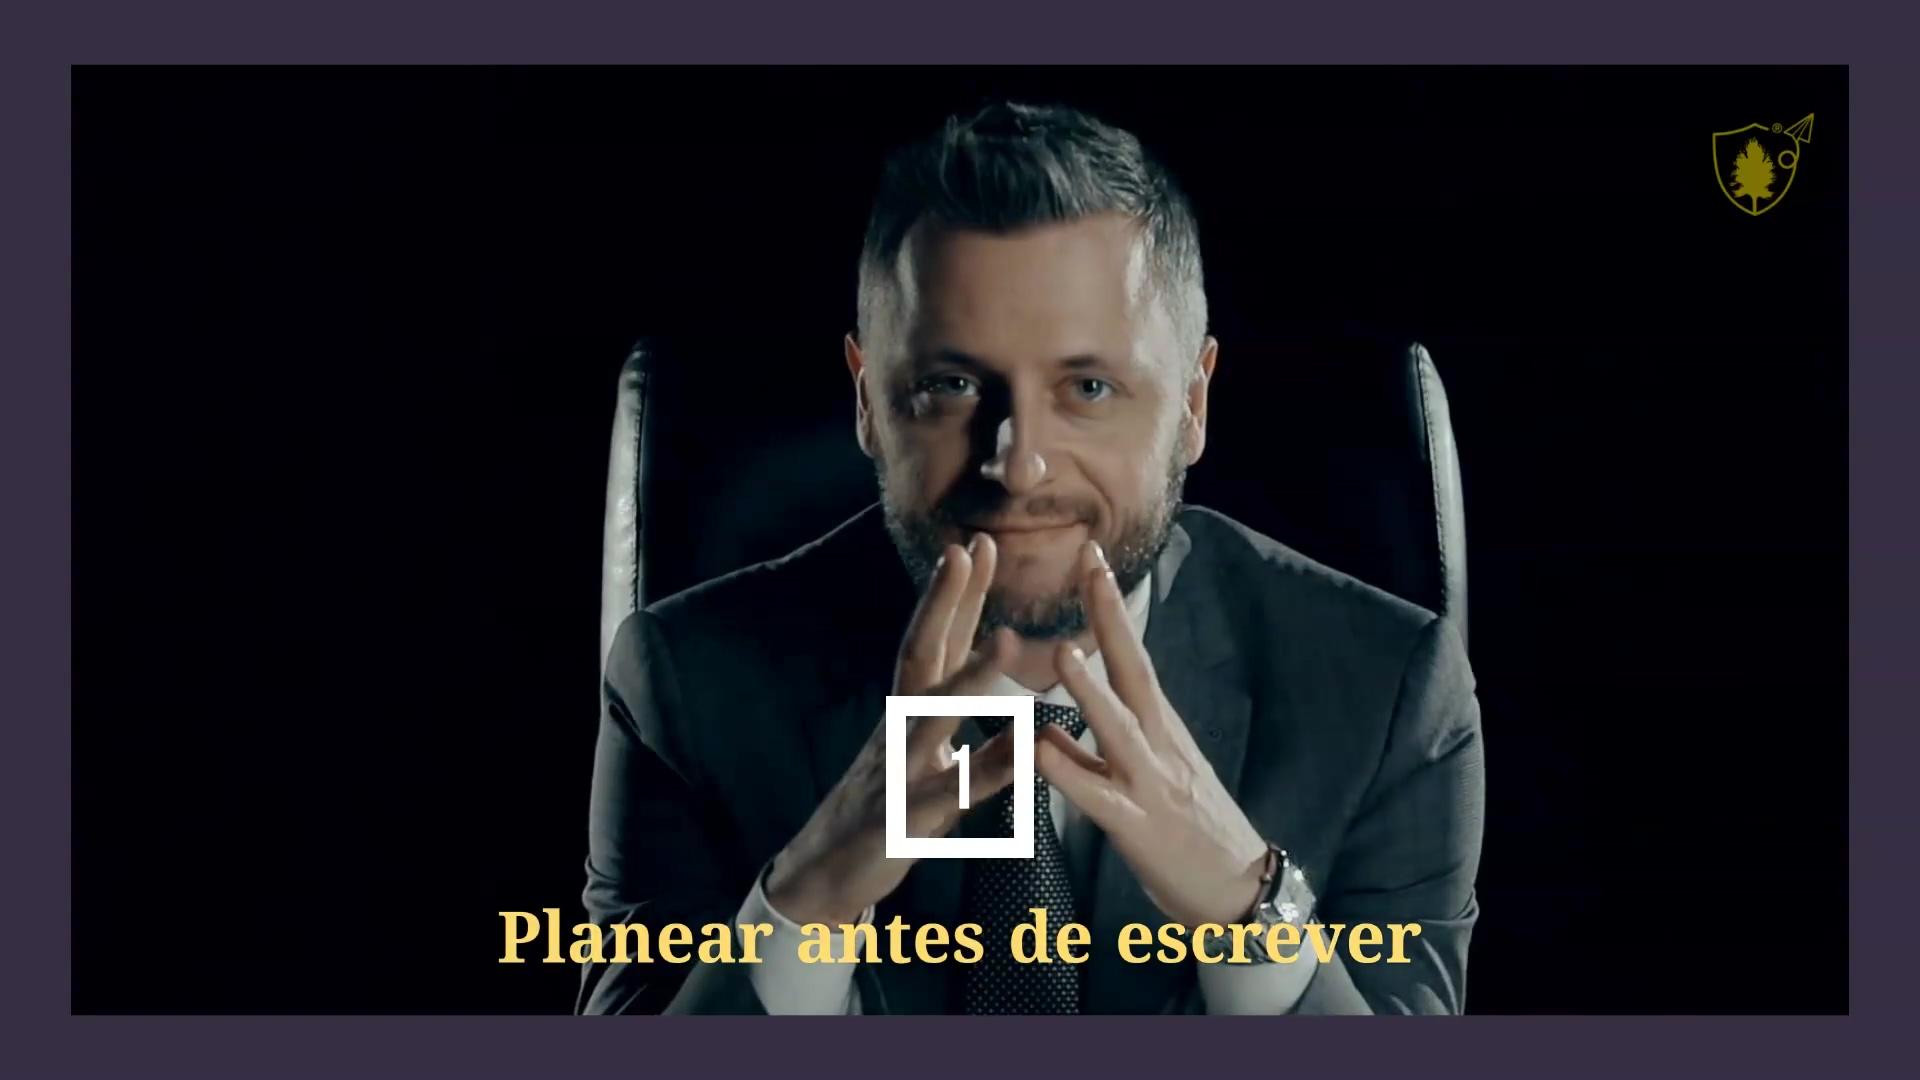 E_se_de_repente_ti (2)